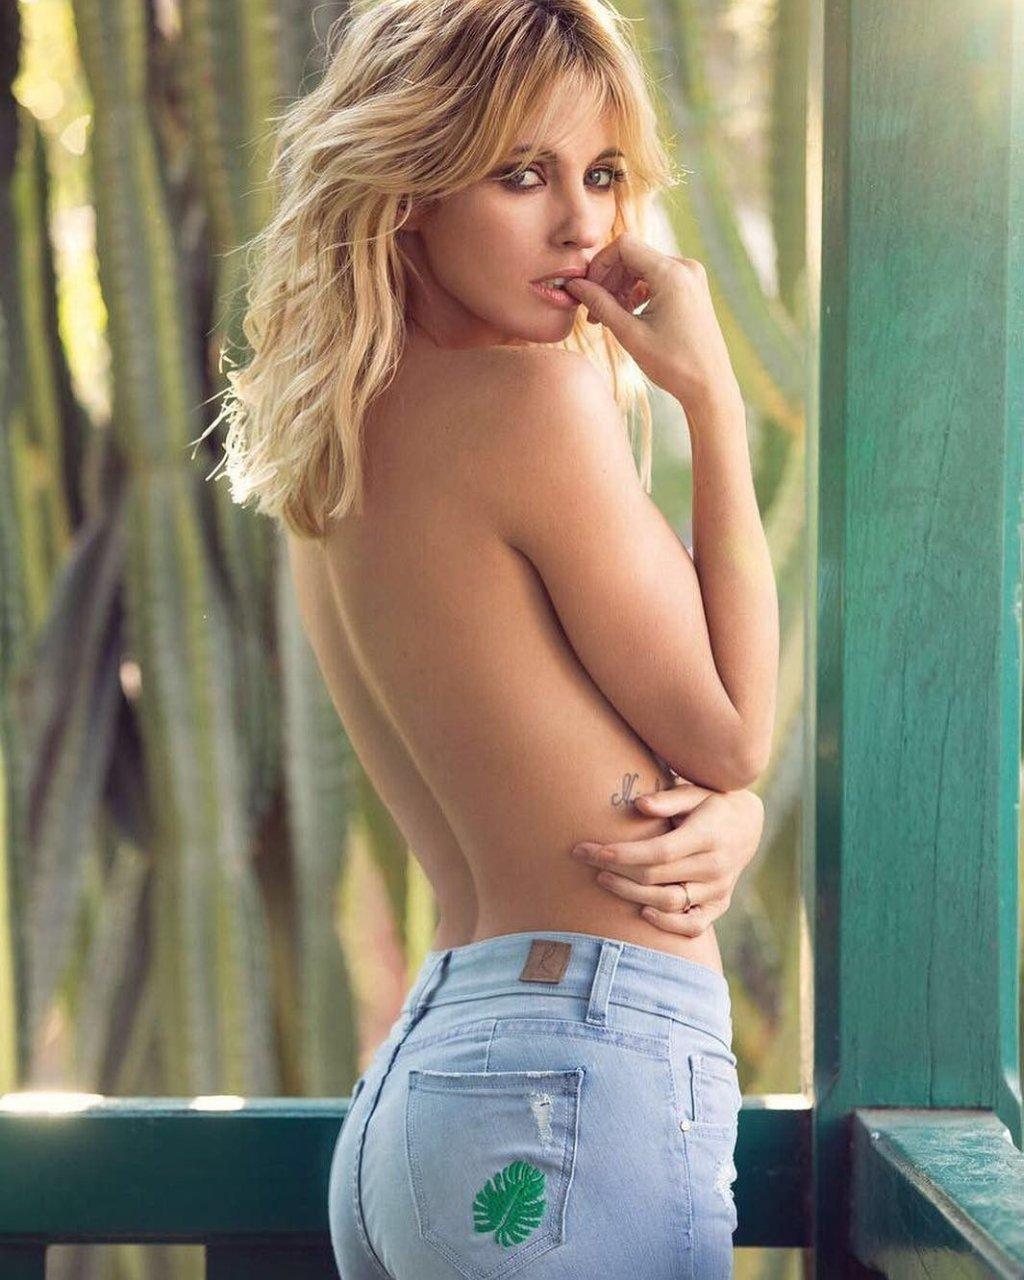 Maricar diaz nude #9